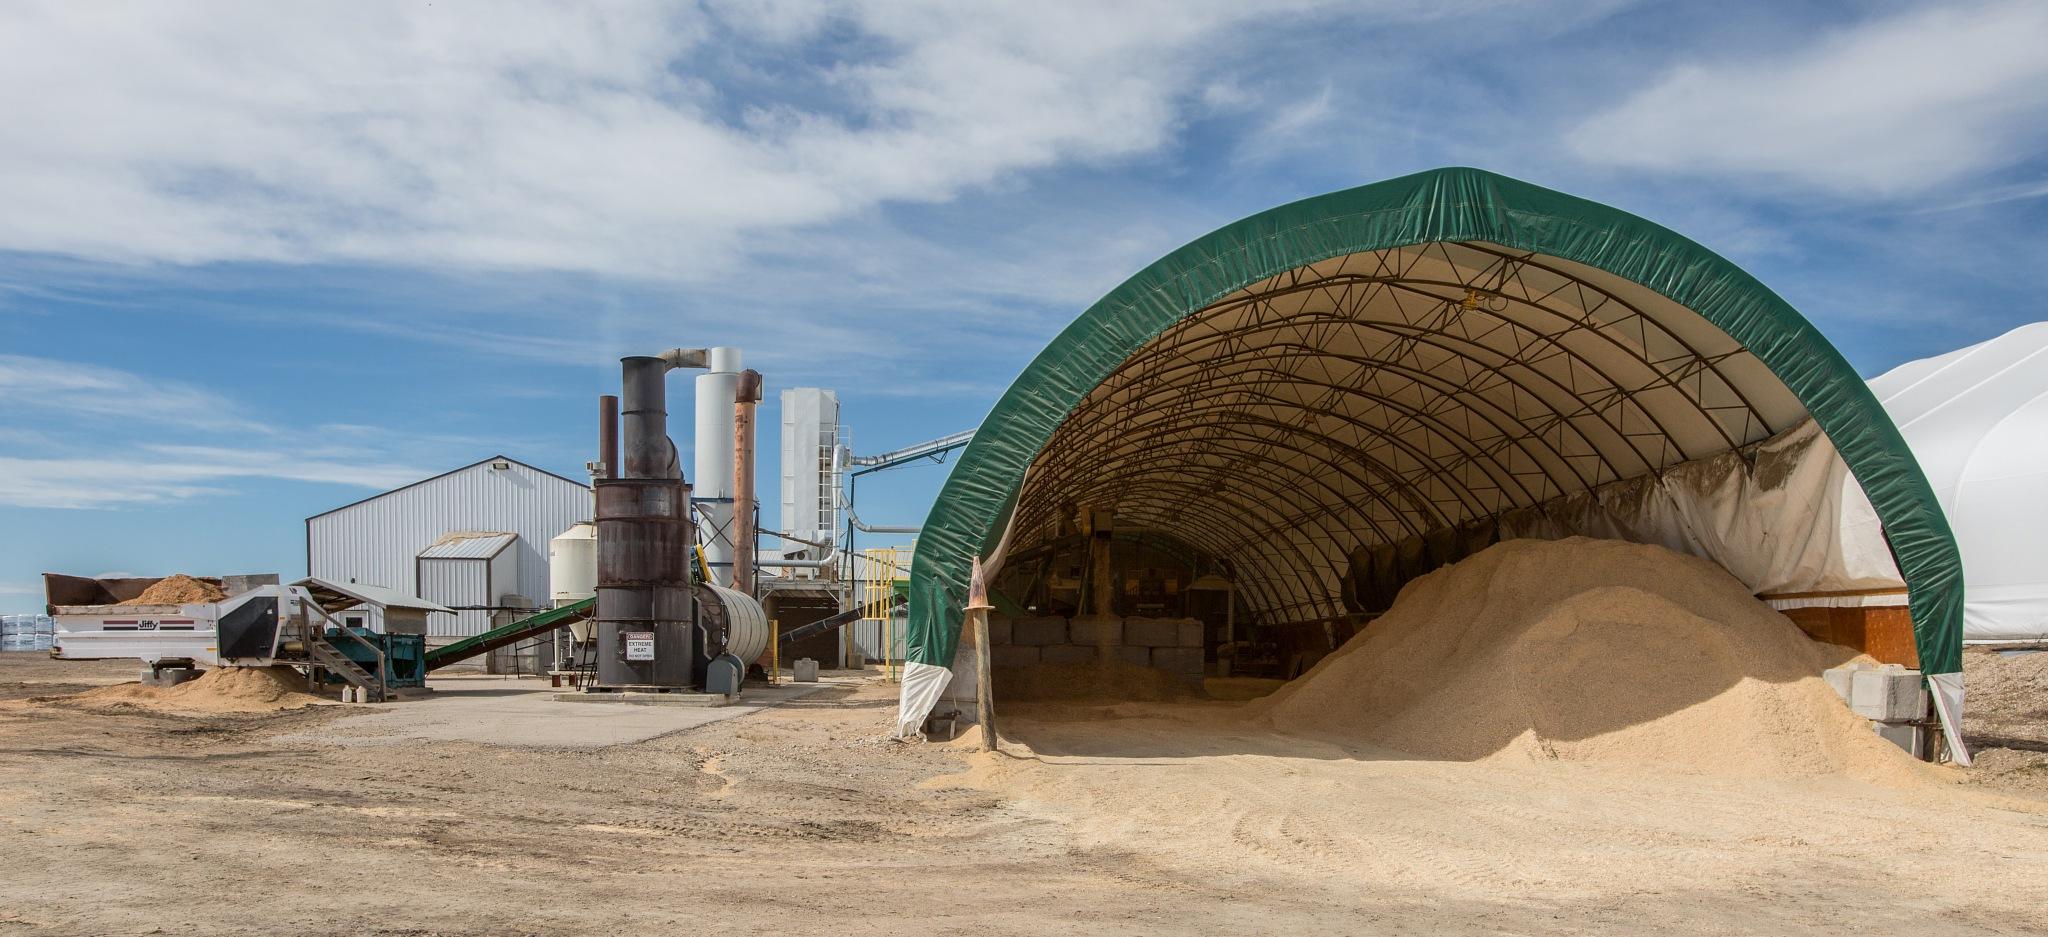 Making Dried Sawdust by John Watson